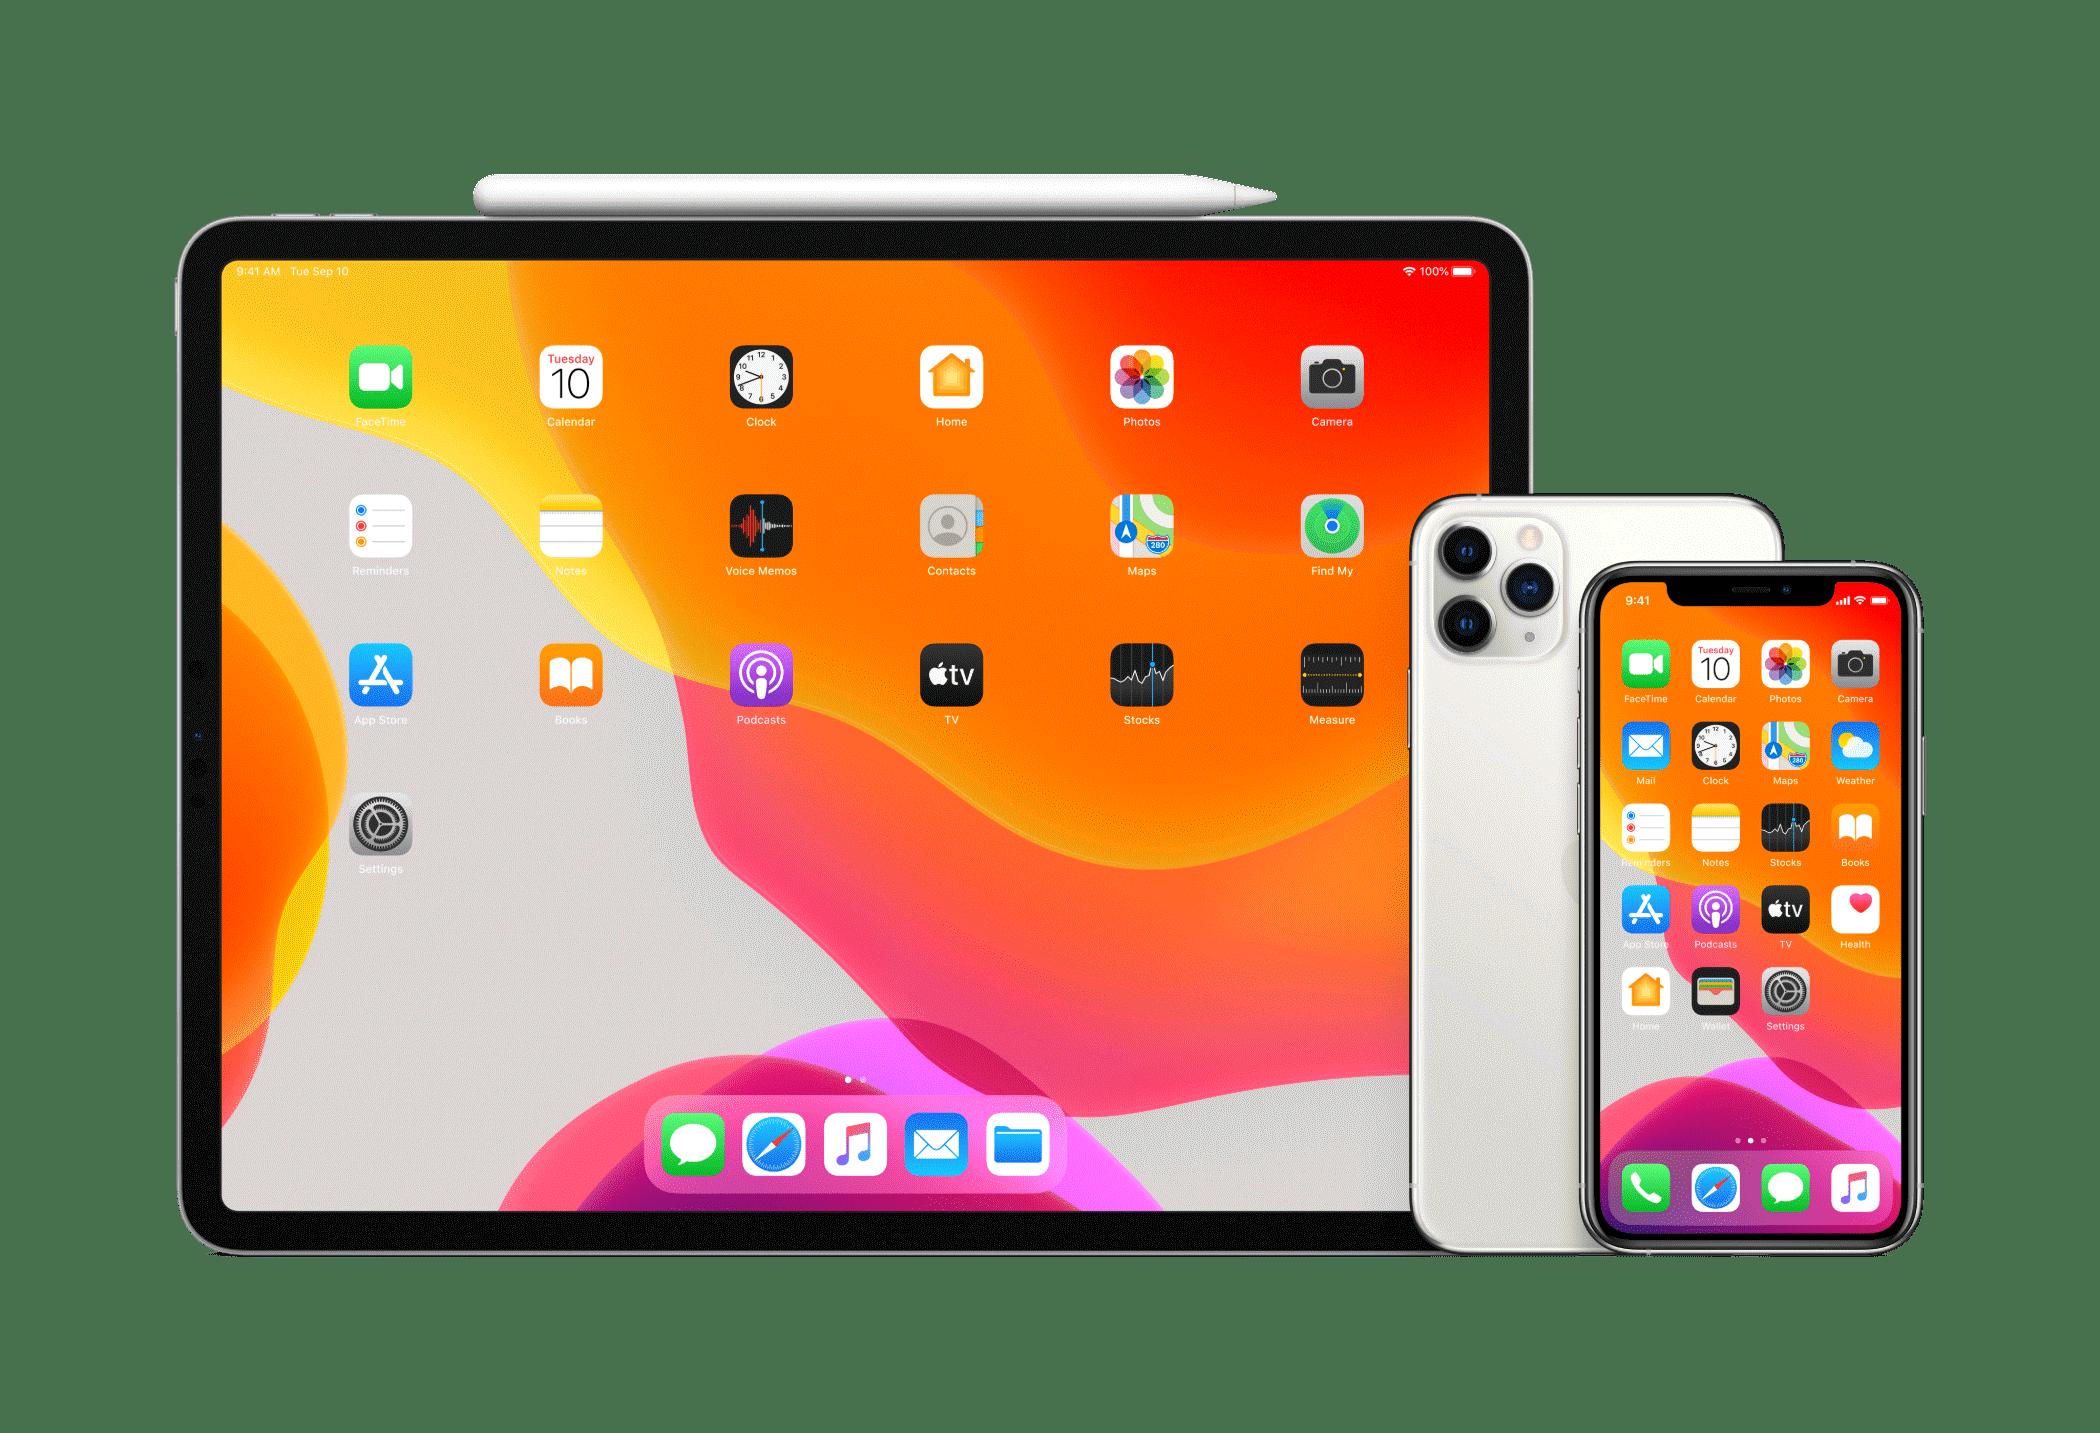 Portable communications device, Rectangle, Gadget, Font